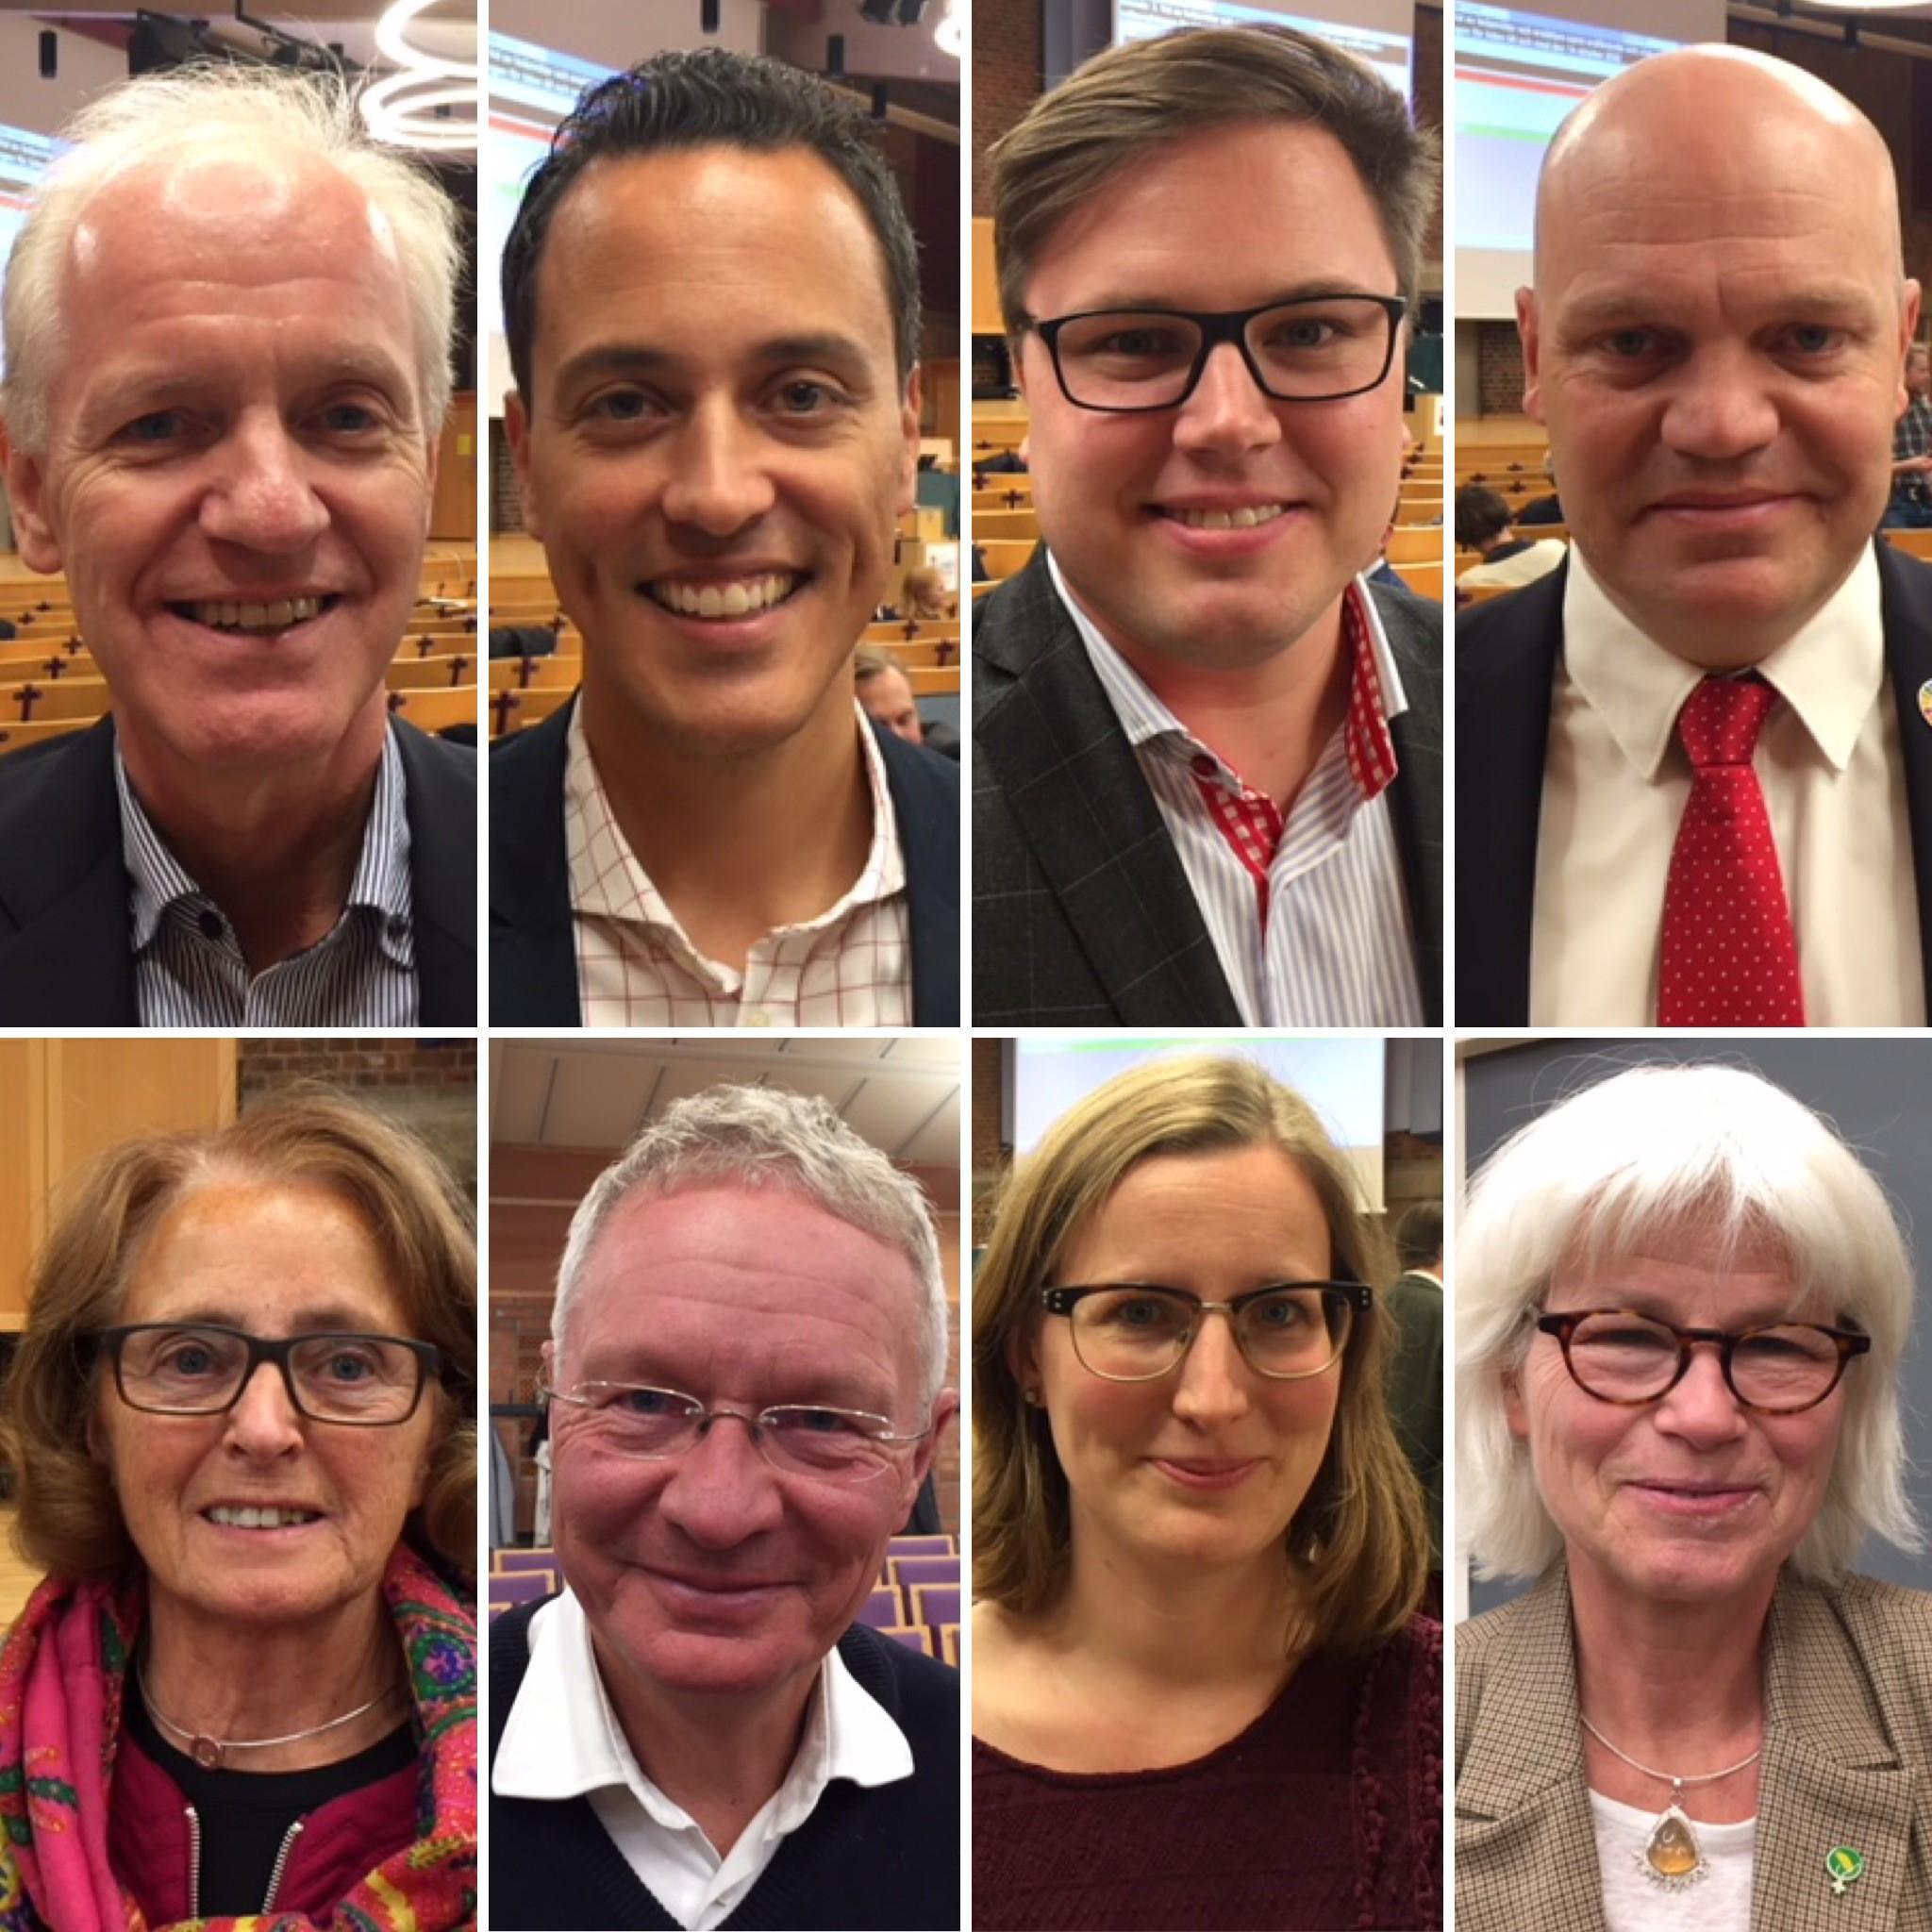 Mats Helmfrid (M), Philip Sandberg (L), Fredrik Ljunghill (M),  Anders Almgren (S), Inga-Kerstin Eriksson (C), Börje Hed (FNL), Fanny Johansson (S), Karin Svensson Smith (MP)